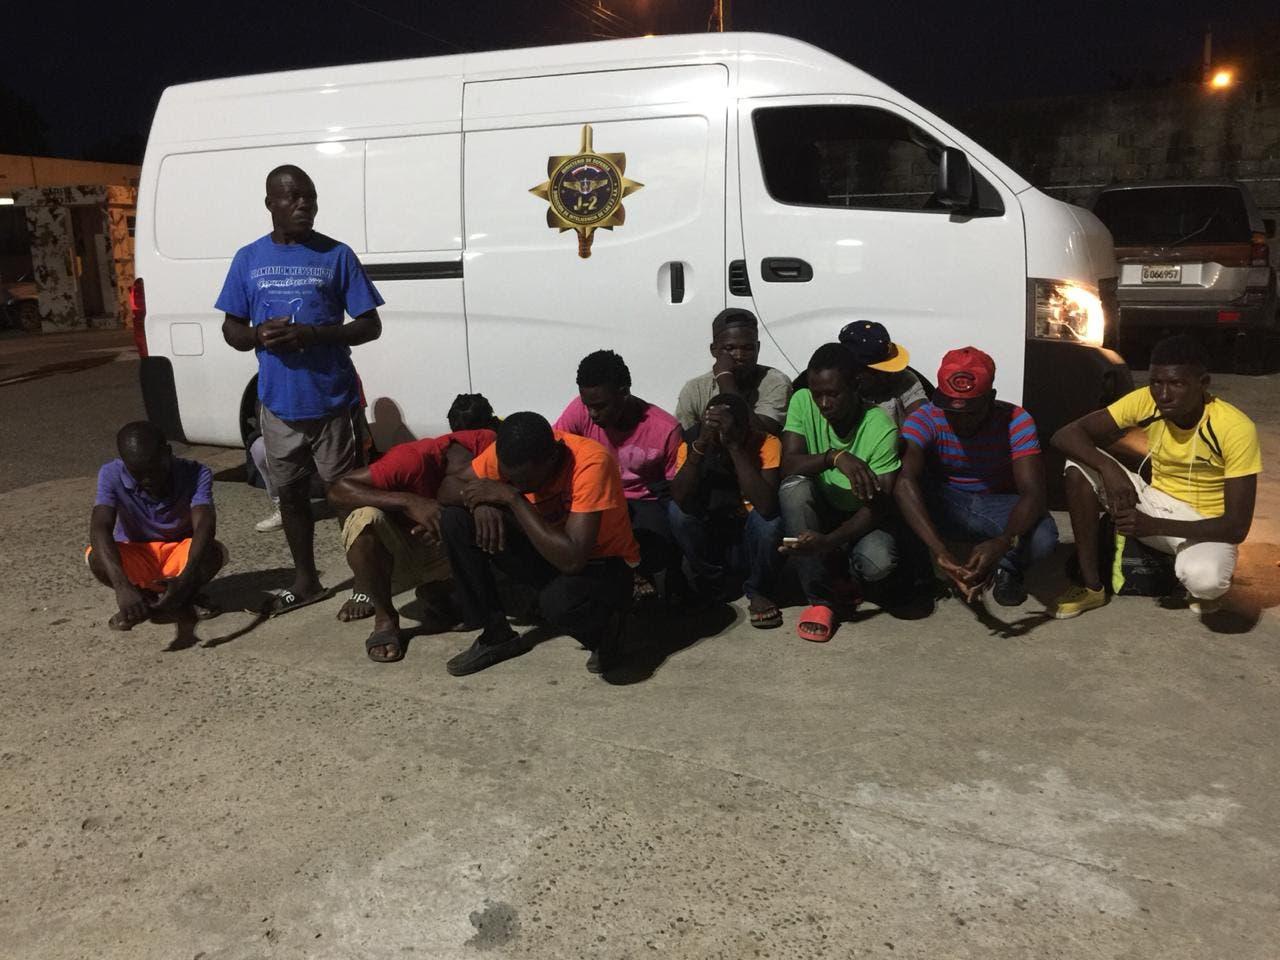 Apresan 13 haitianos en Jimaní pretendían llevar varias motocicletas ilegal a Haití